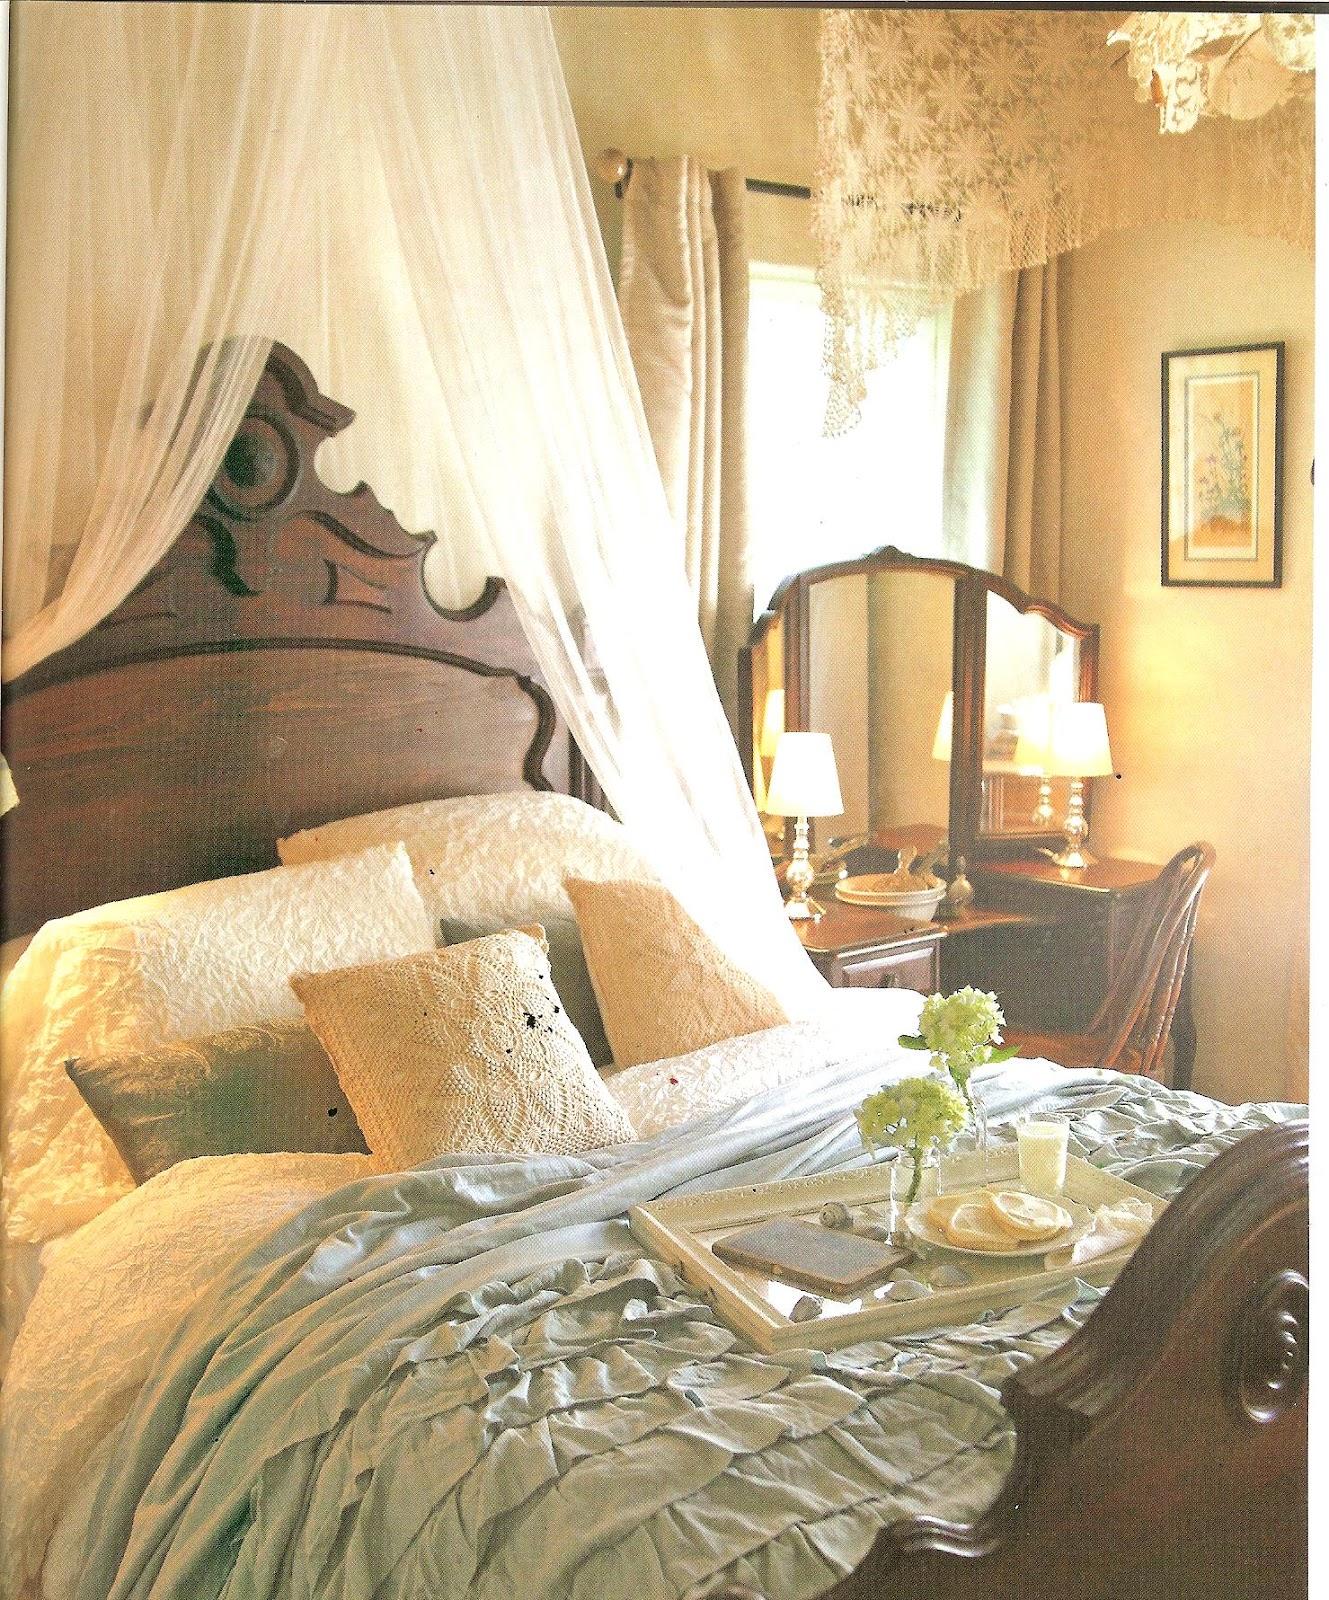 NANA DIANA TAKES A BREAK: Romantic Homes For August